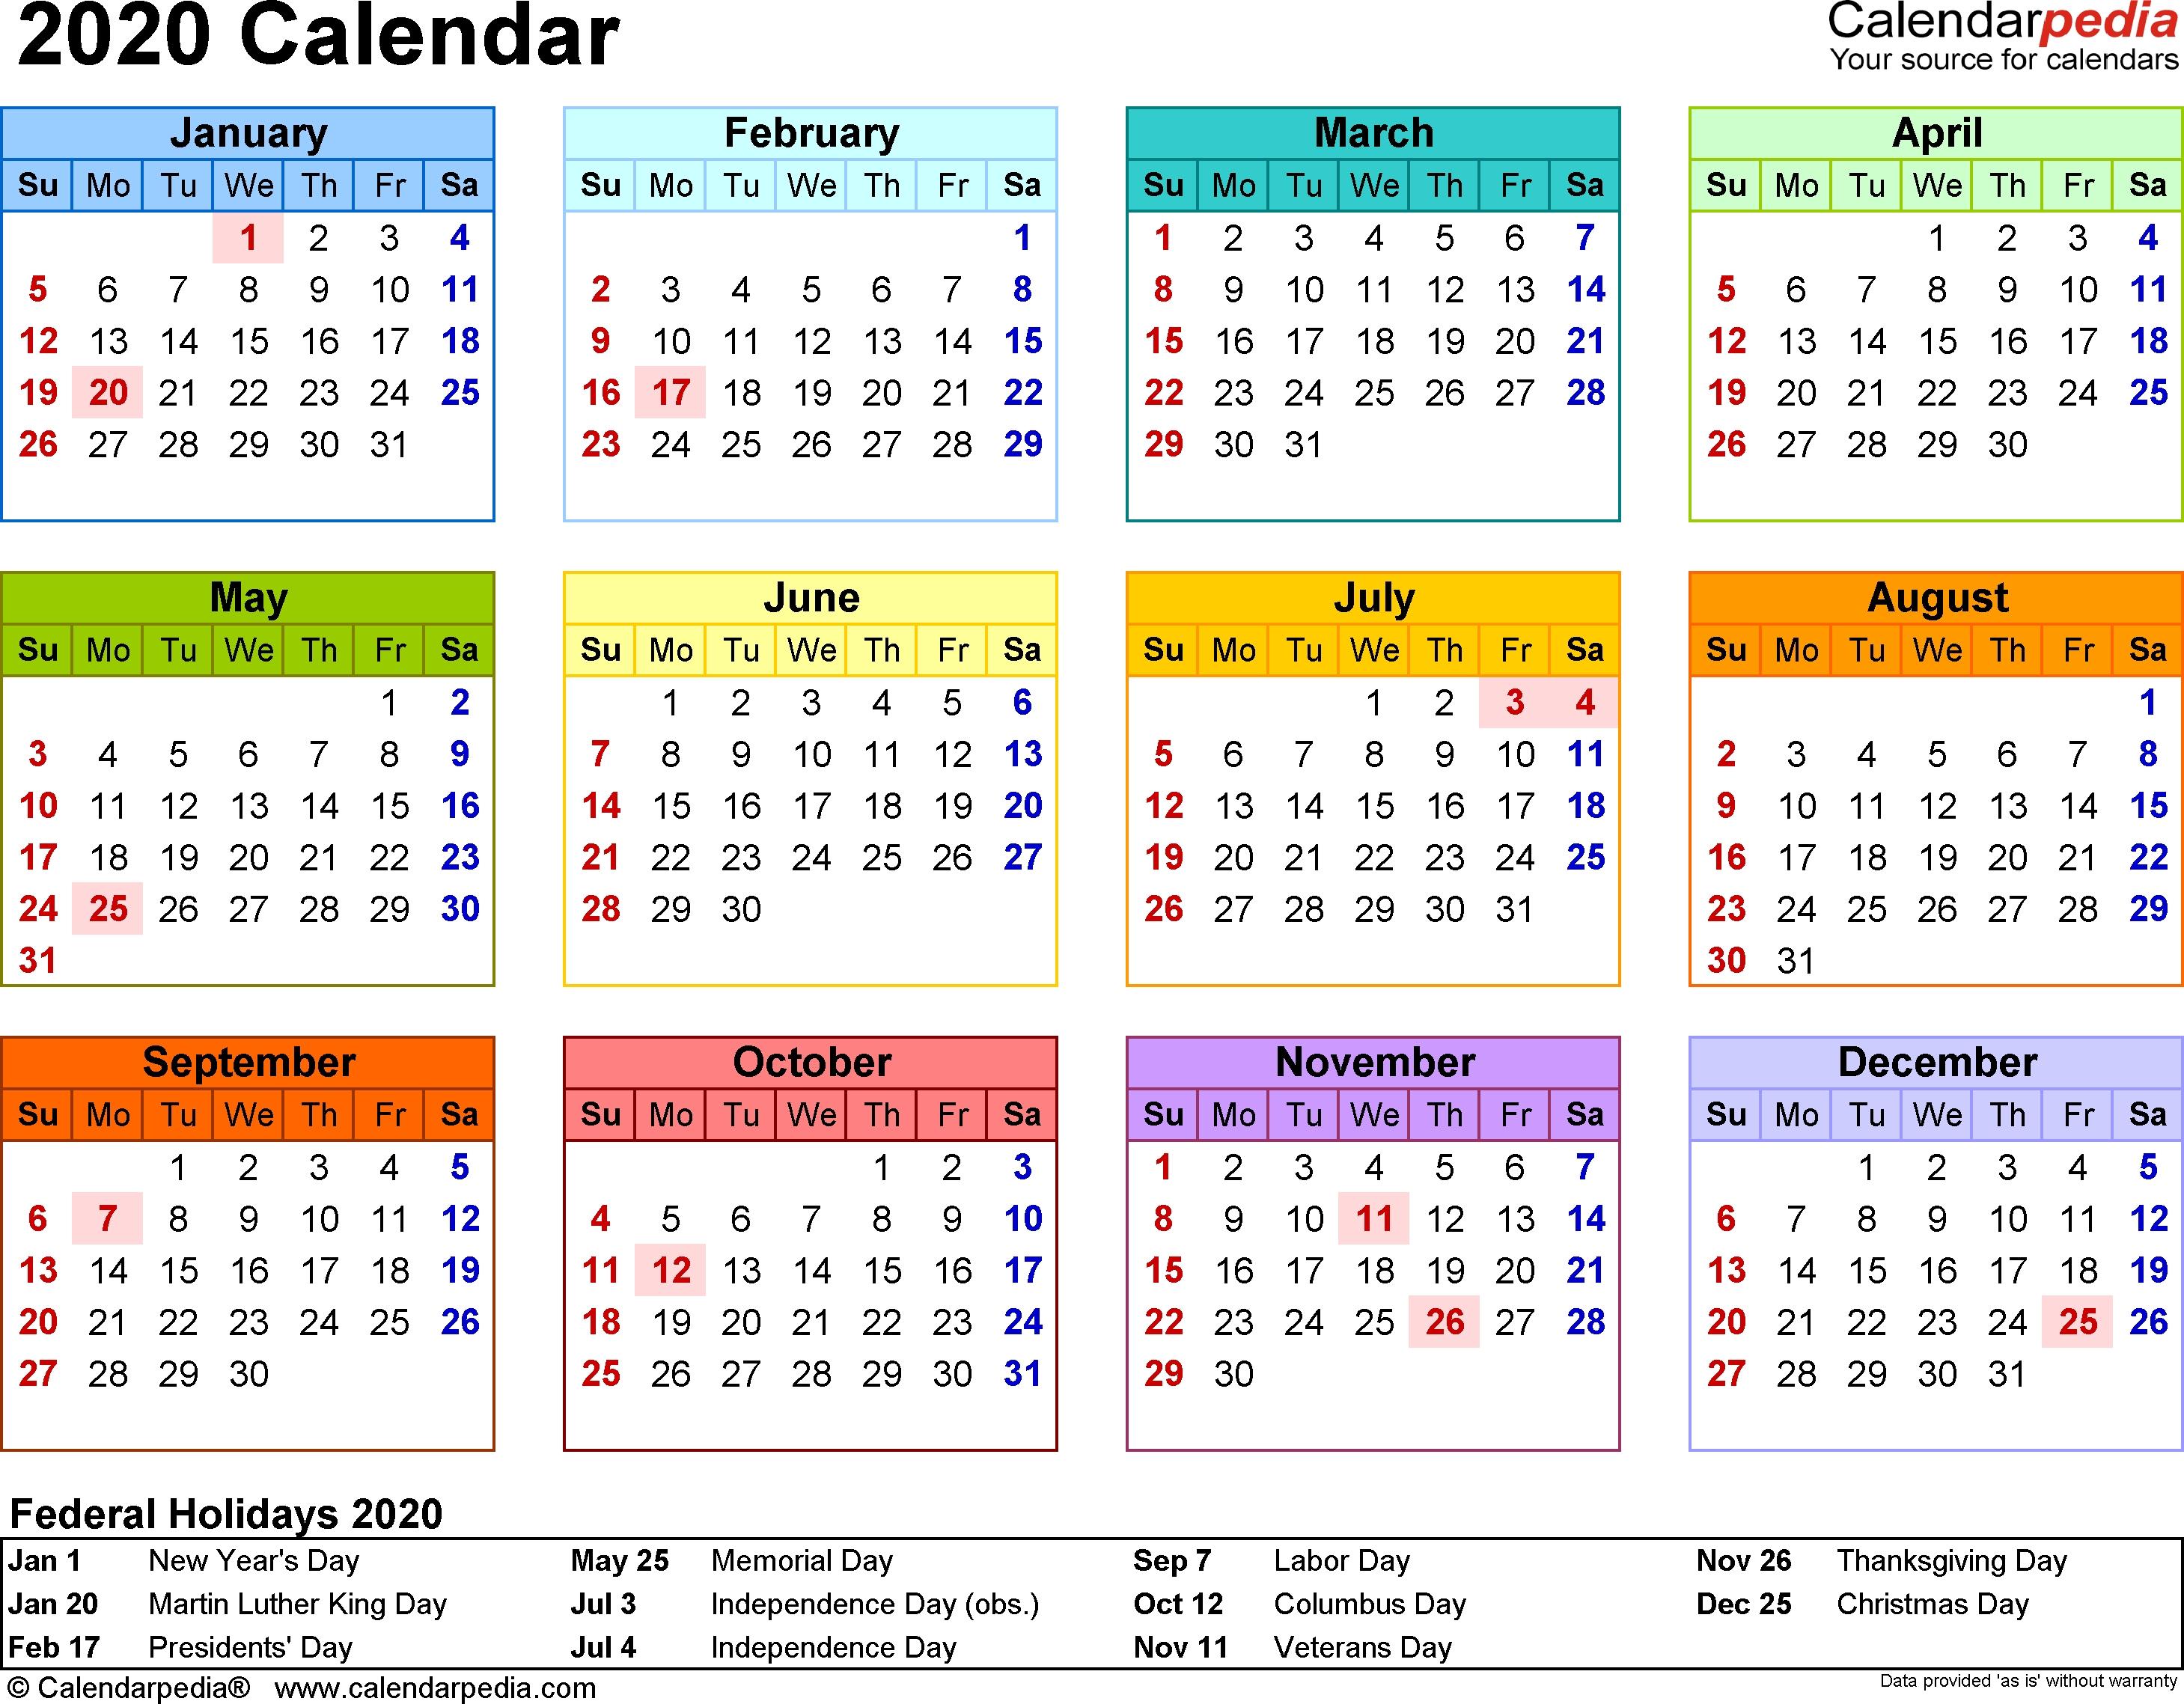 2020 Calendar Pdf - 18 Free Printable Calendar Templates-2020 Monthly 2 Page Calendar